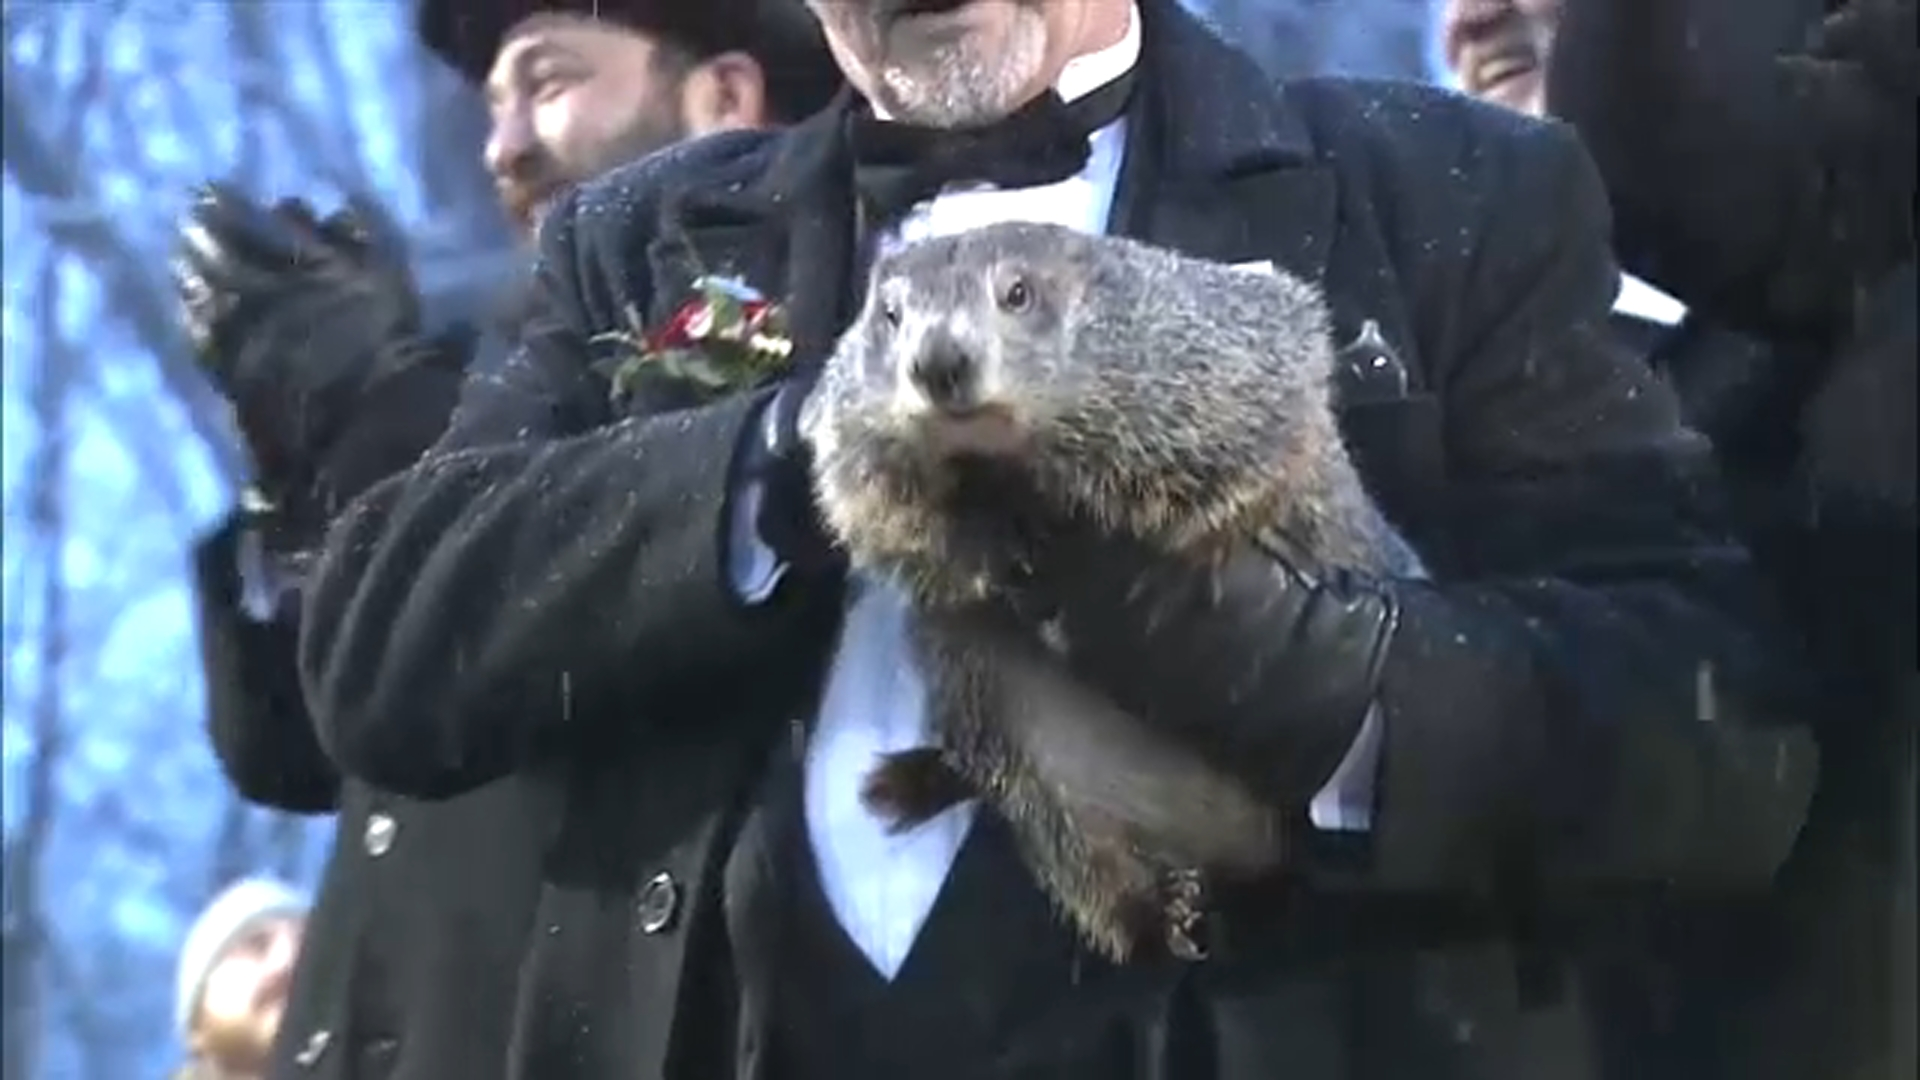 Groundhog Day 2020 Punxsutawney Phil predicts early spring 1920x1080